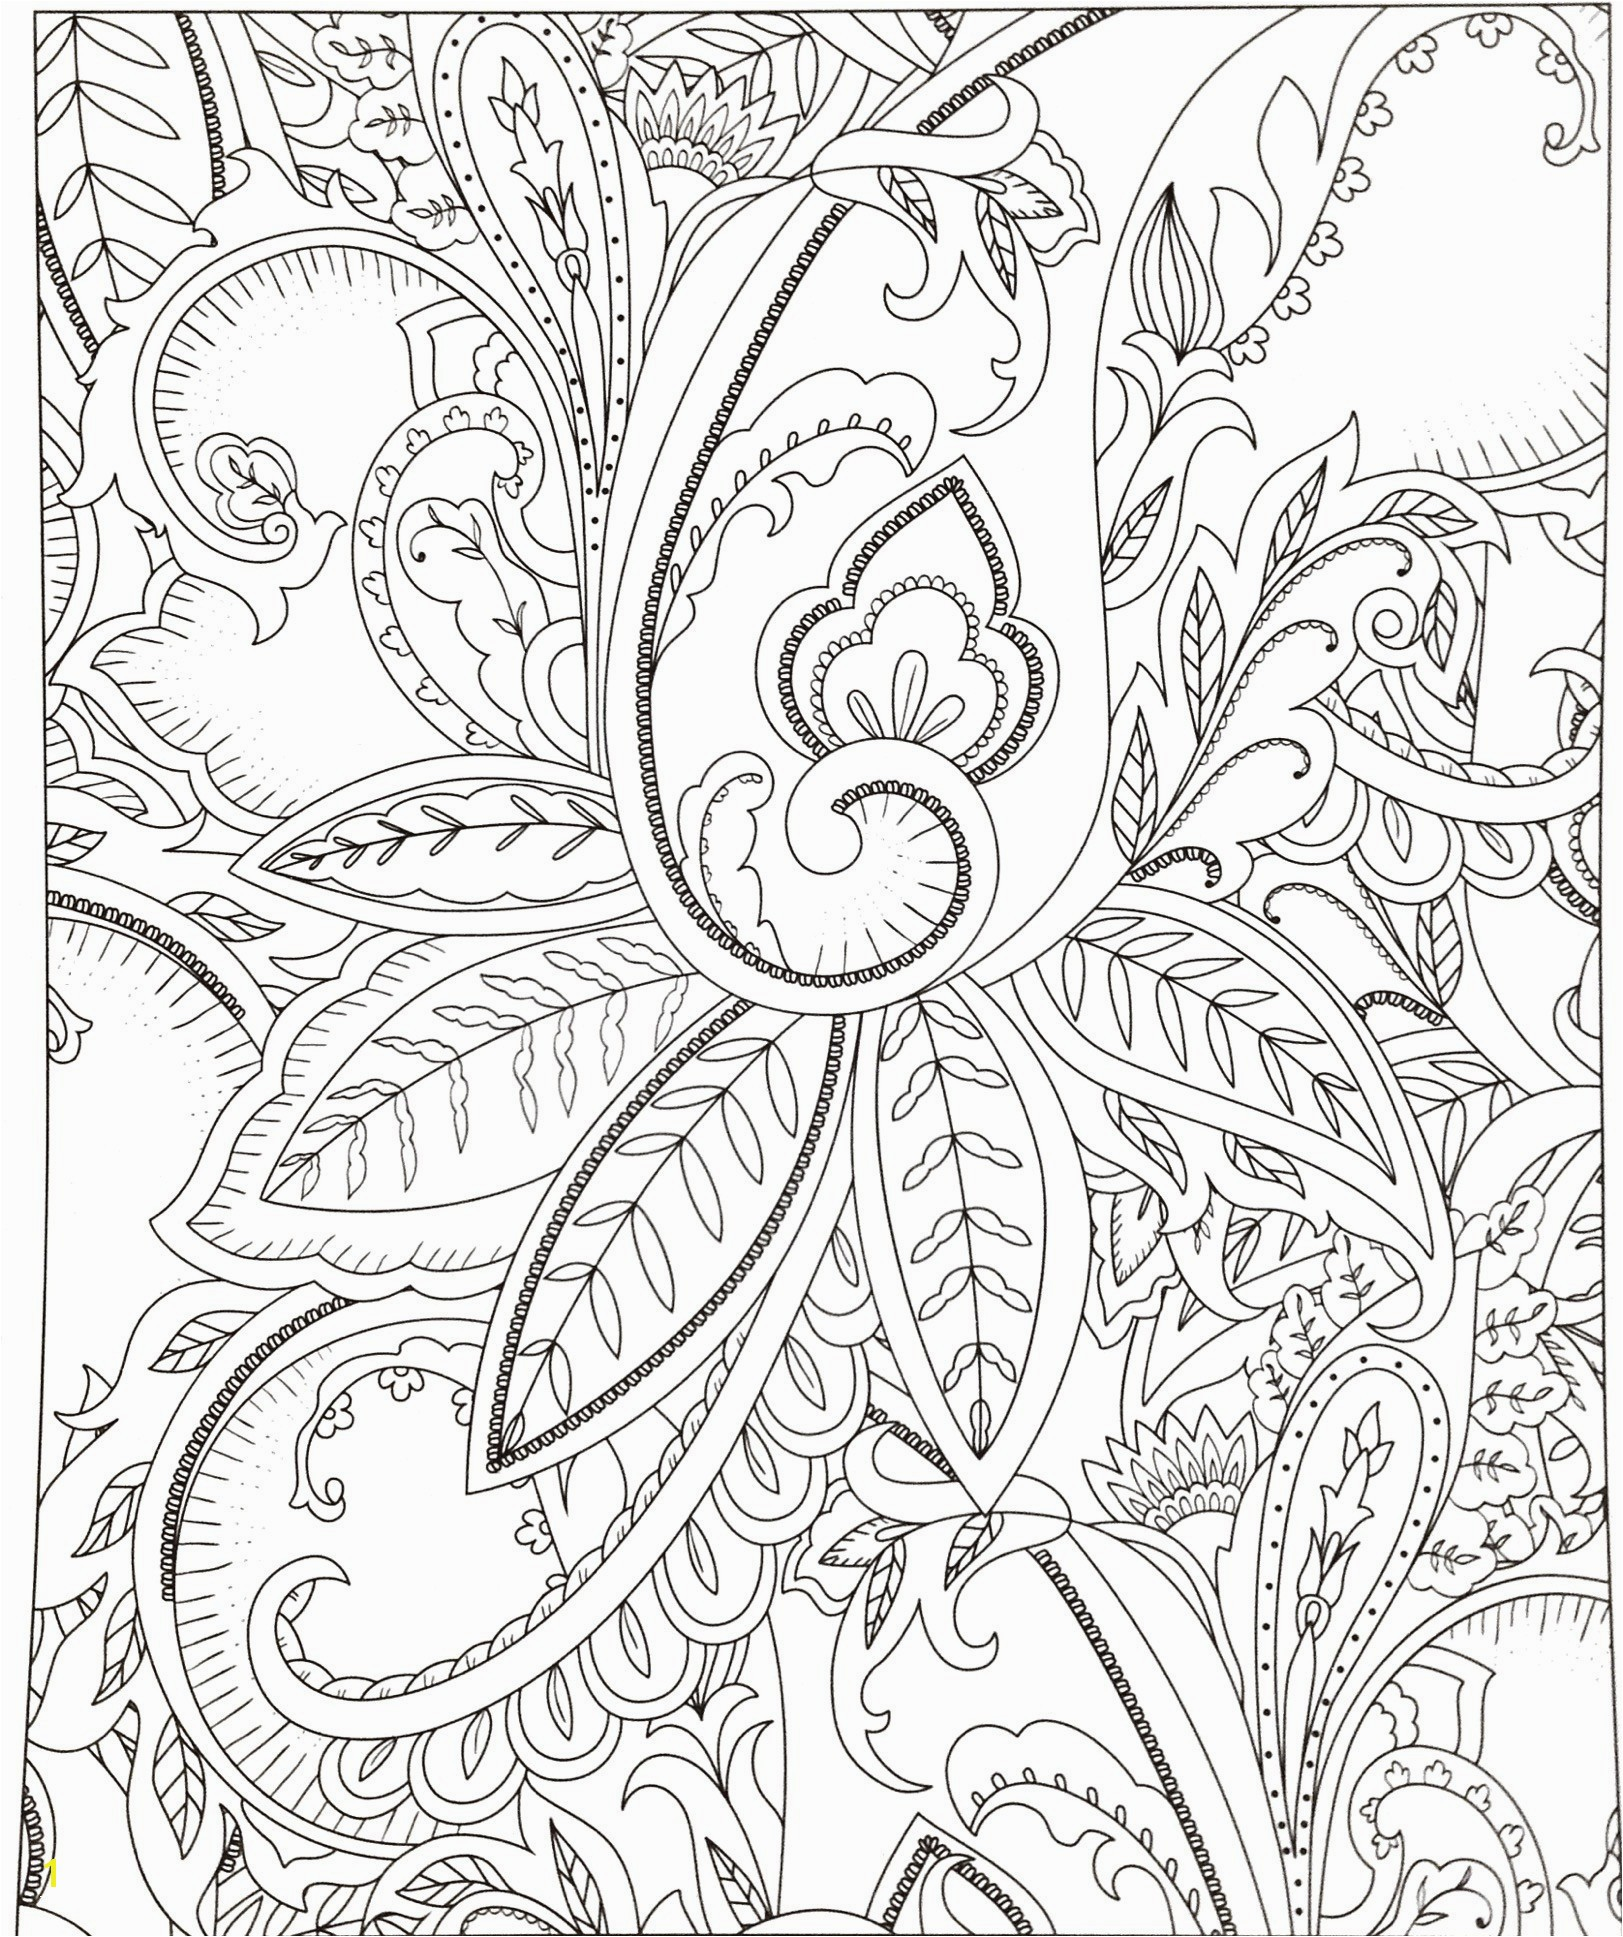 Rainforest Coloring Page Jungle Coloring Pages Rainforest Coloring Page Heathermarxgallery